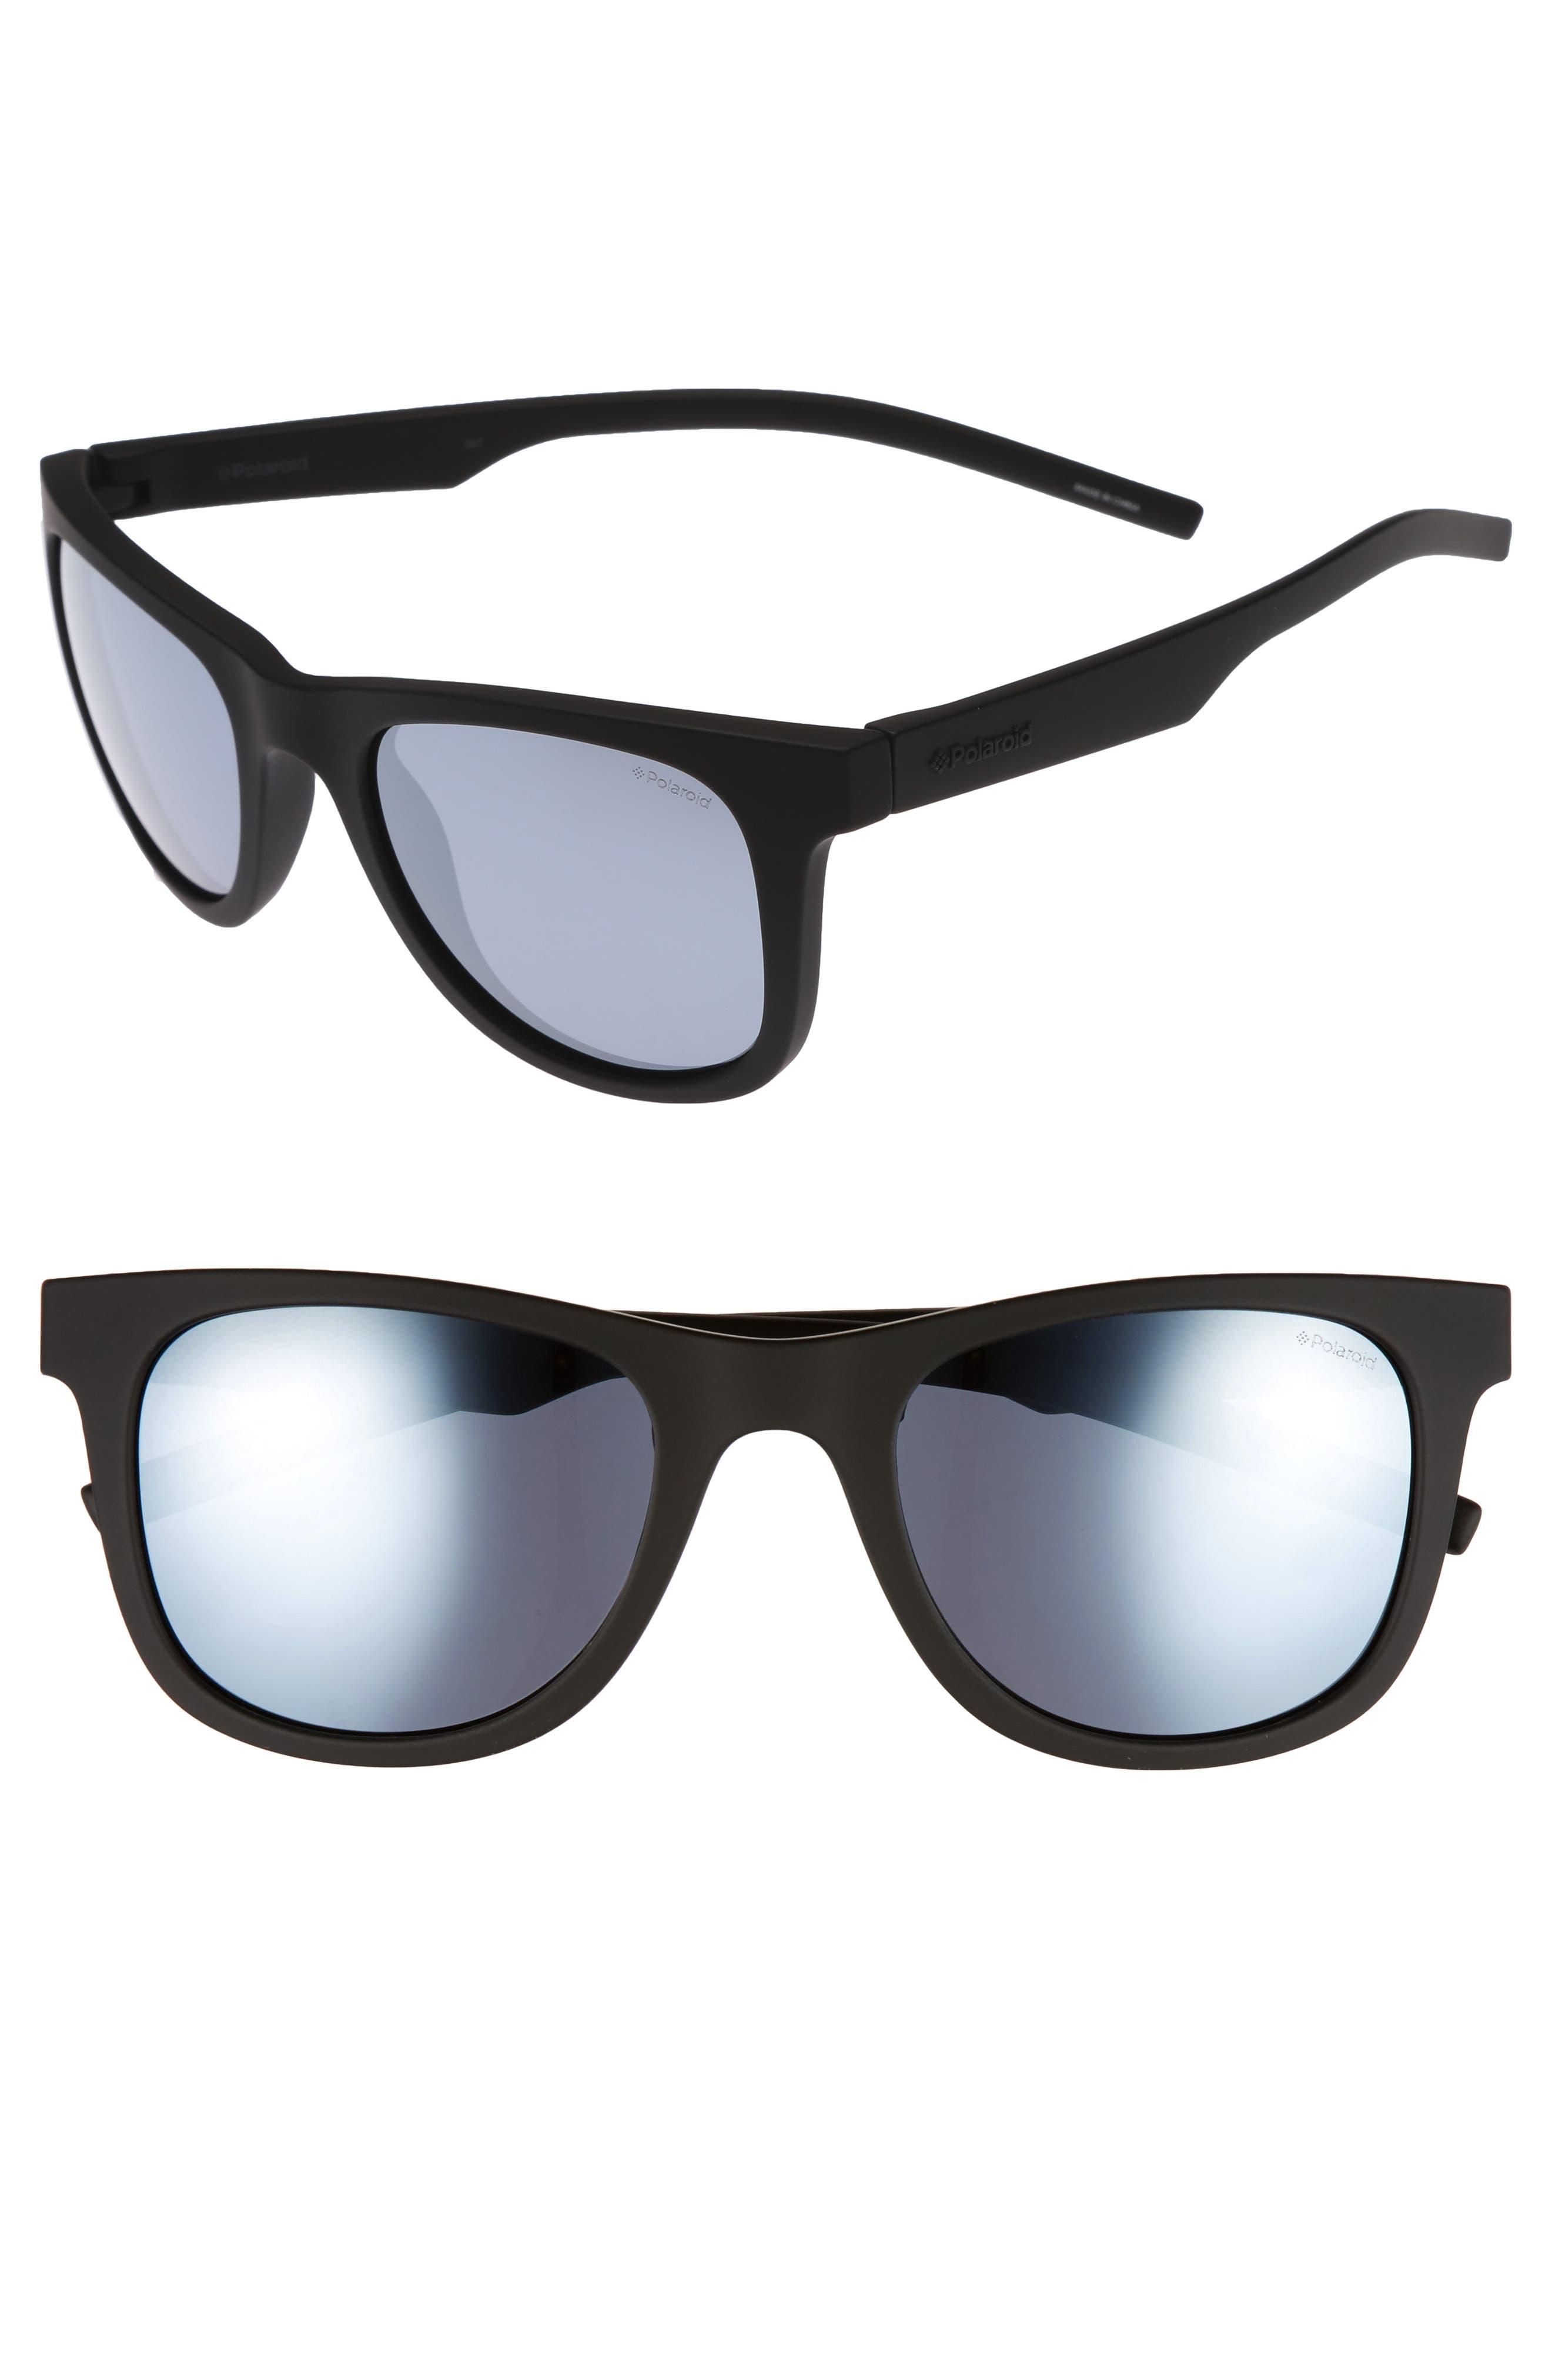 Alternate Image 1 Selected - Polaroid 7020S 52mm Polarized Sunglasses